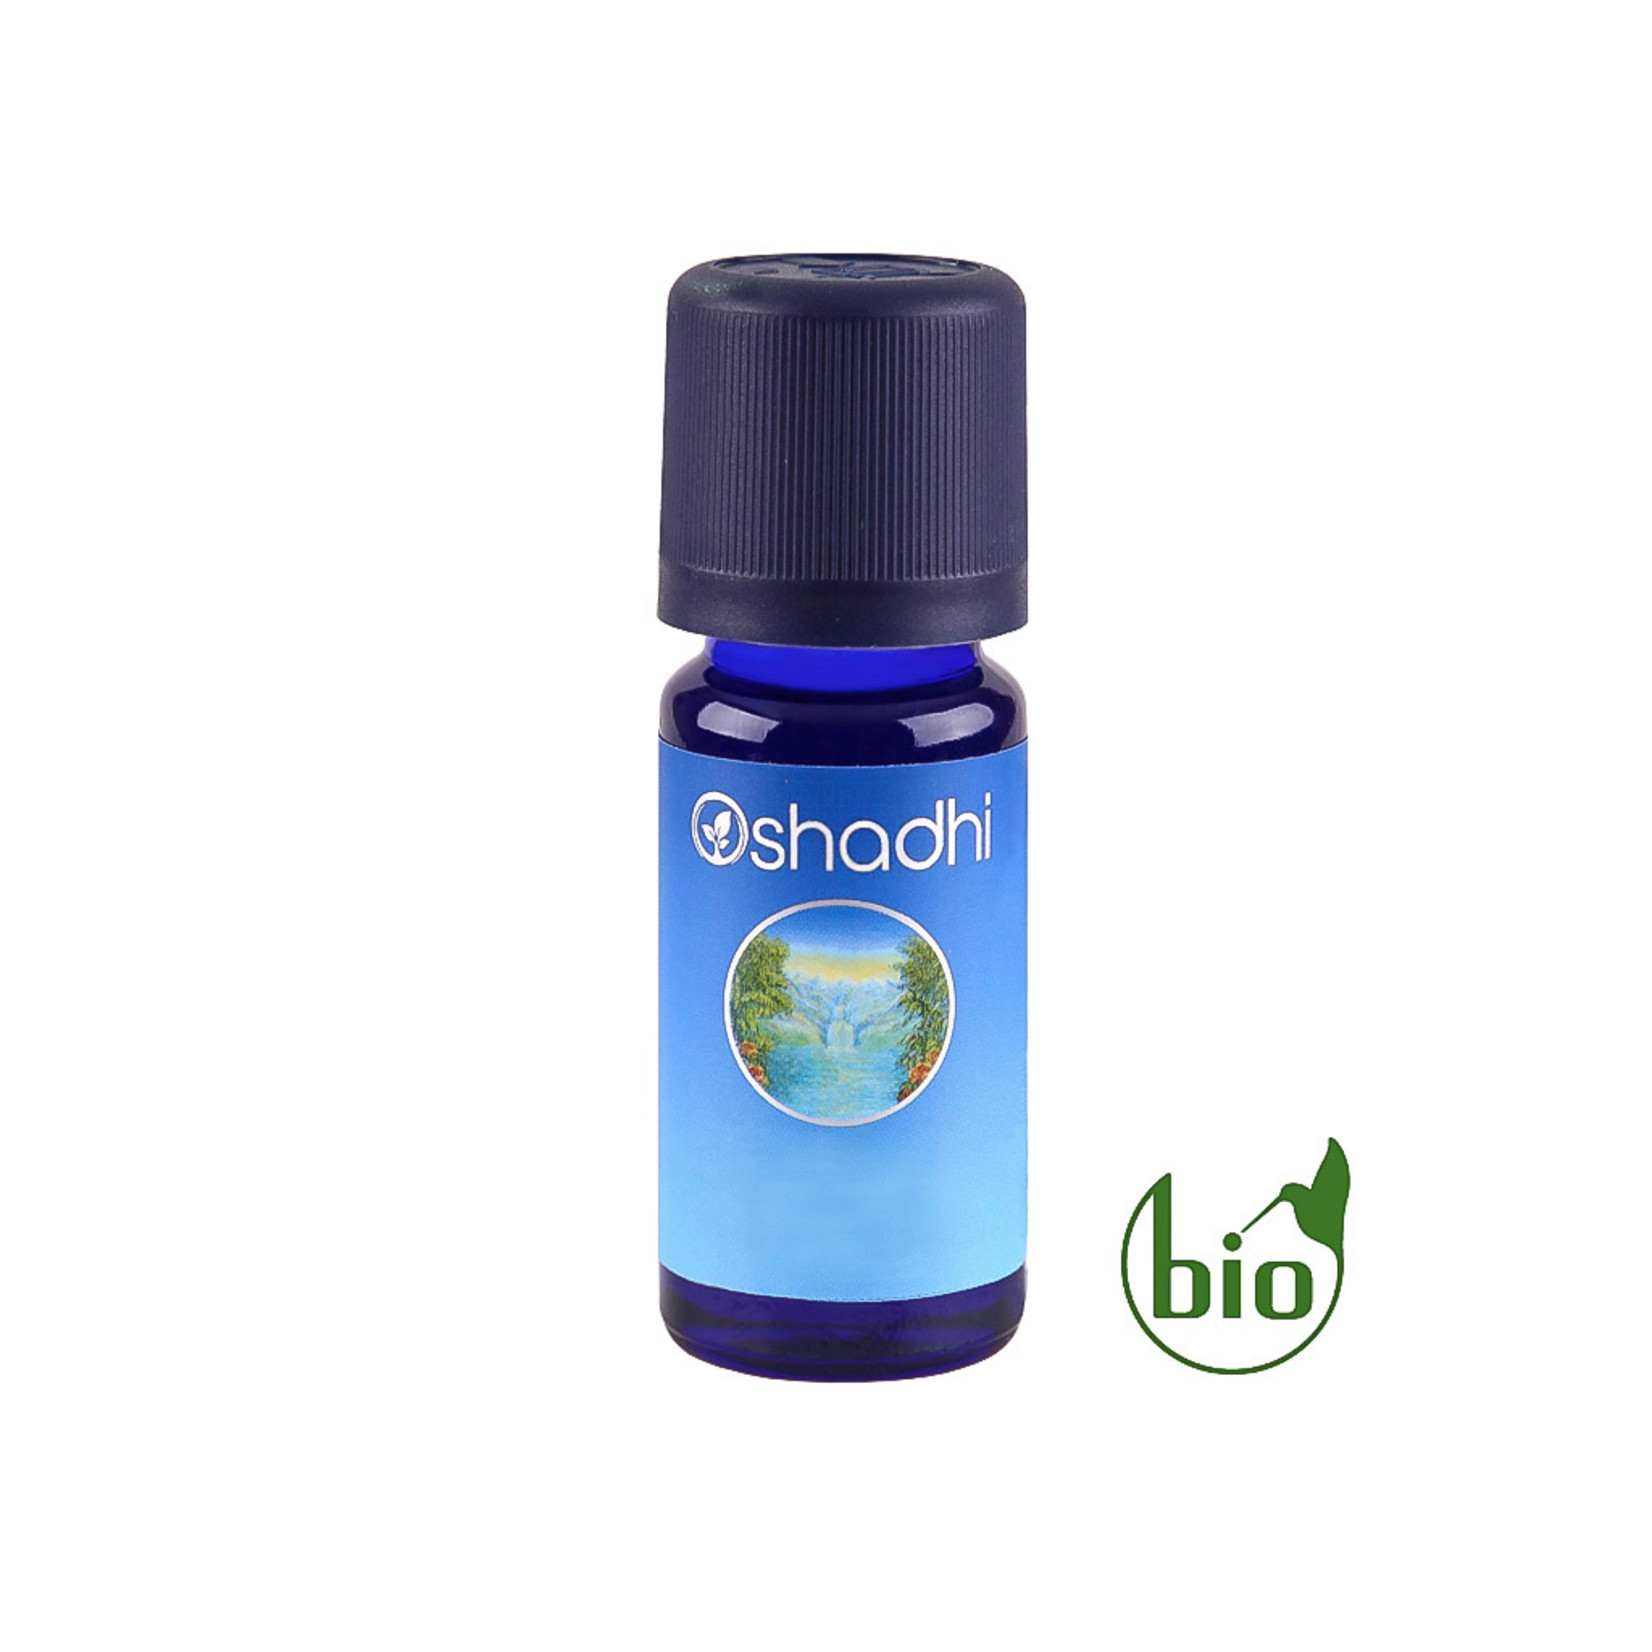 Oshadhi Rozemarijn cineol BIO essentiële olie Oshadhi - opwekkend en verwarmend - 10ml